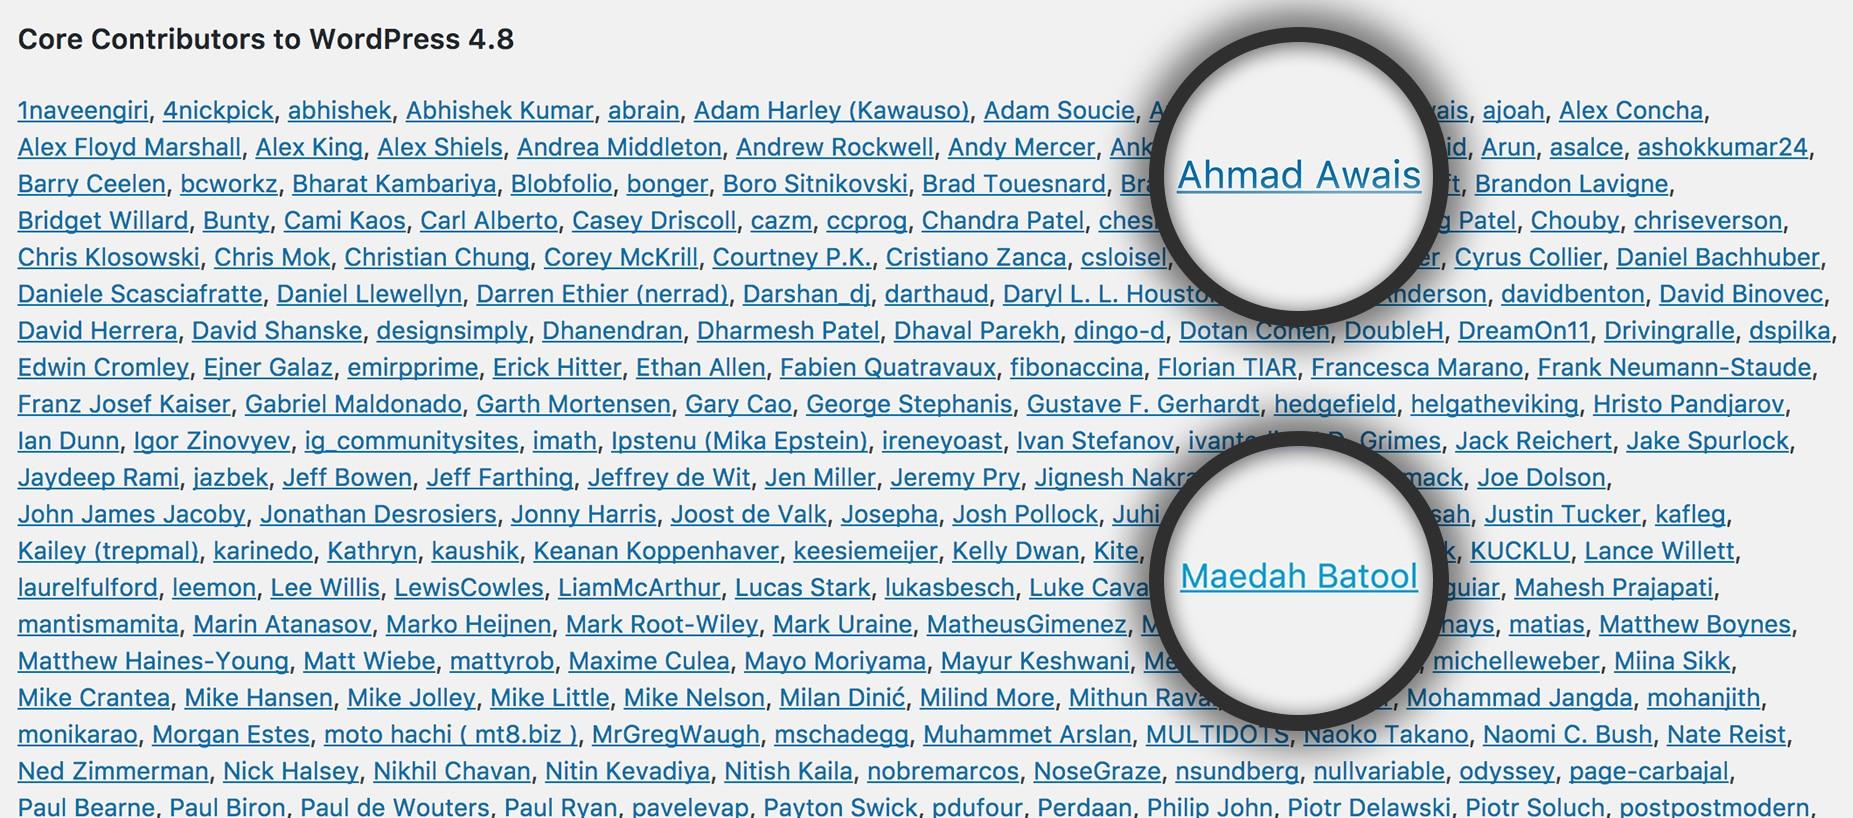 WPCore_Contributor-Ahmad-Awais-Maedah-Batool